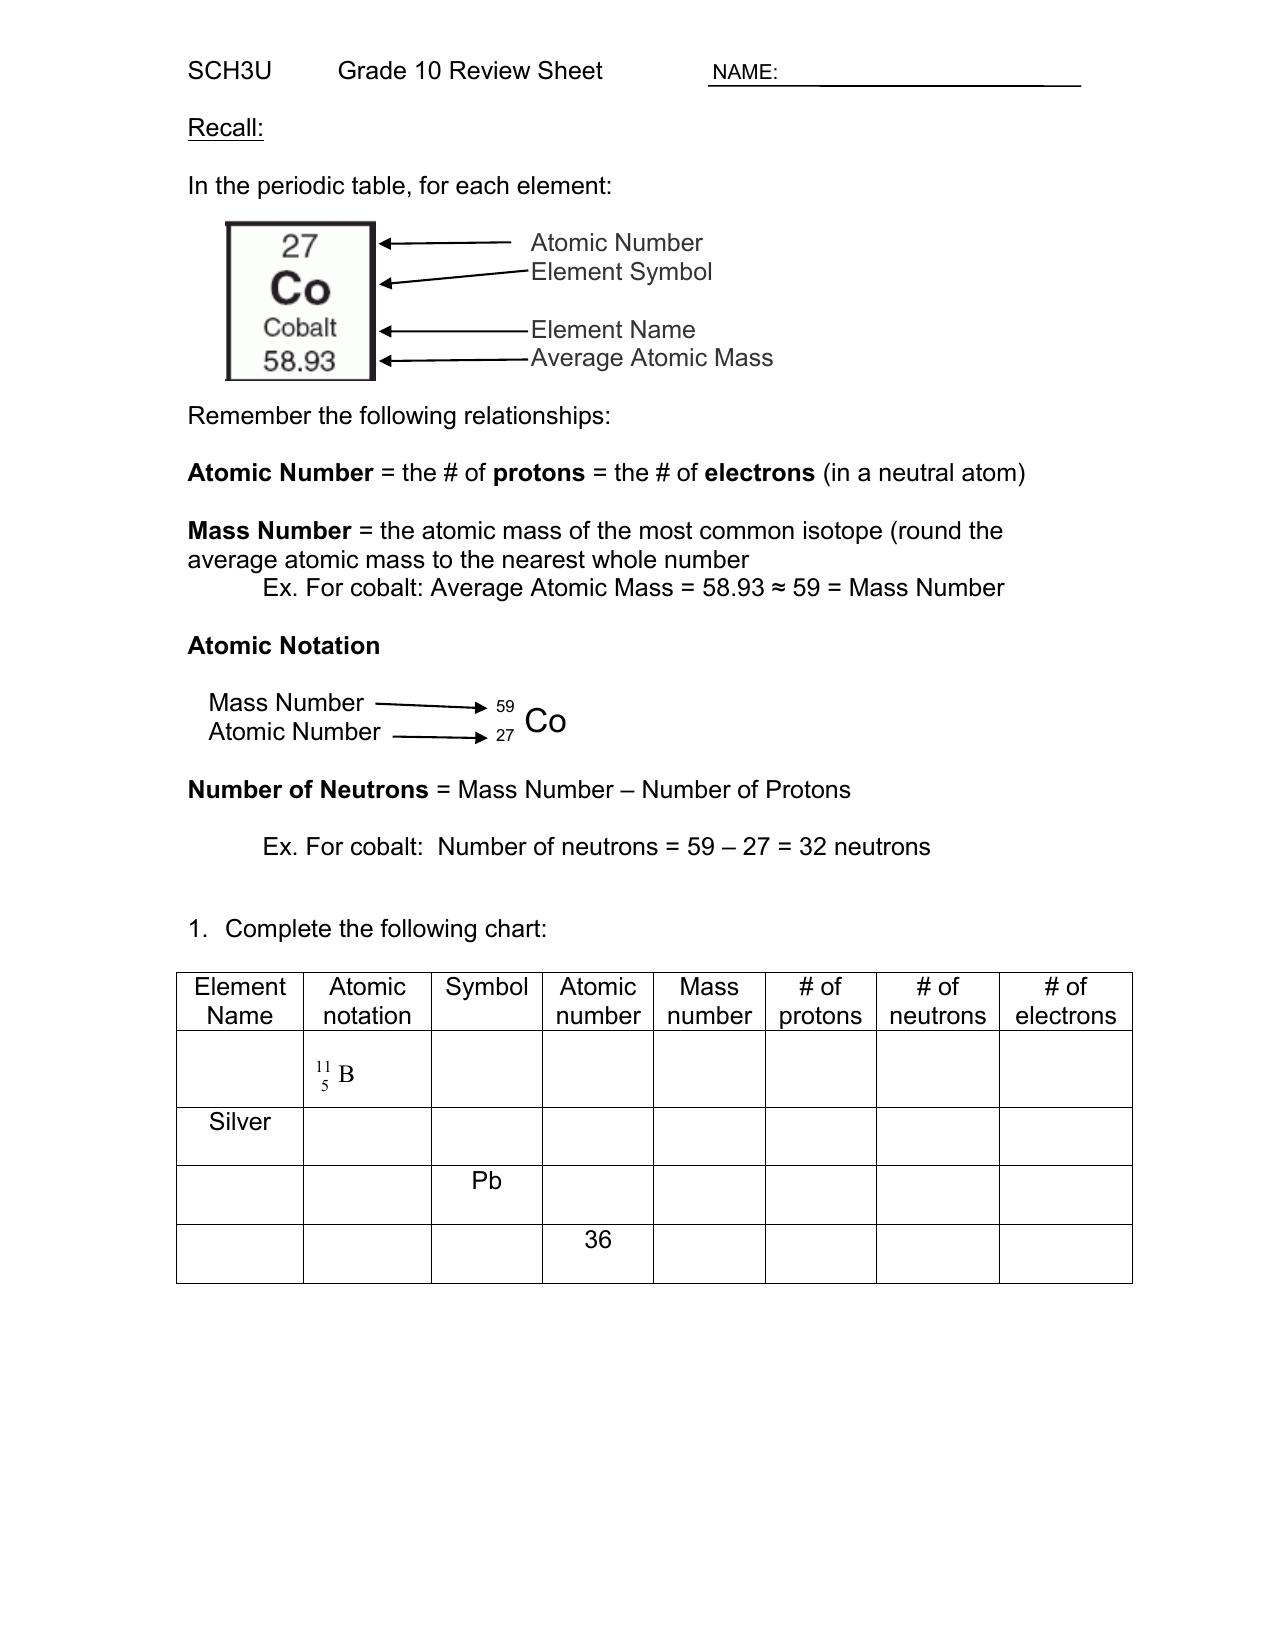 Gr 10 Review sheet chemistry